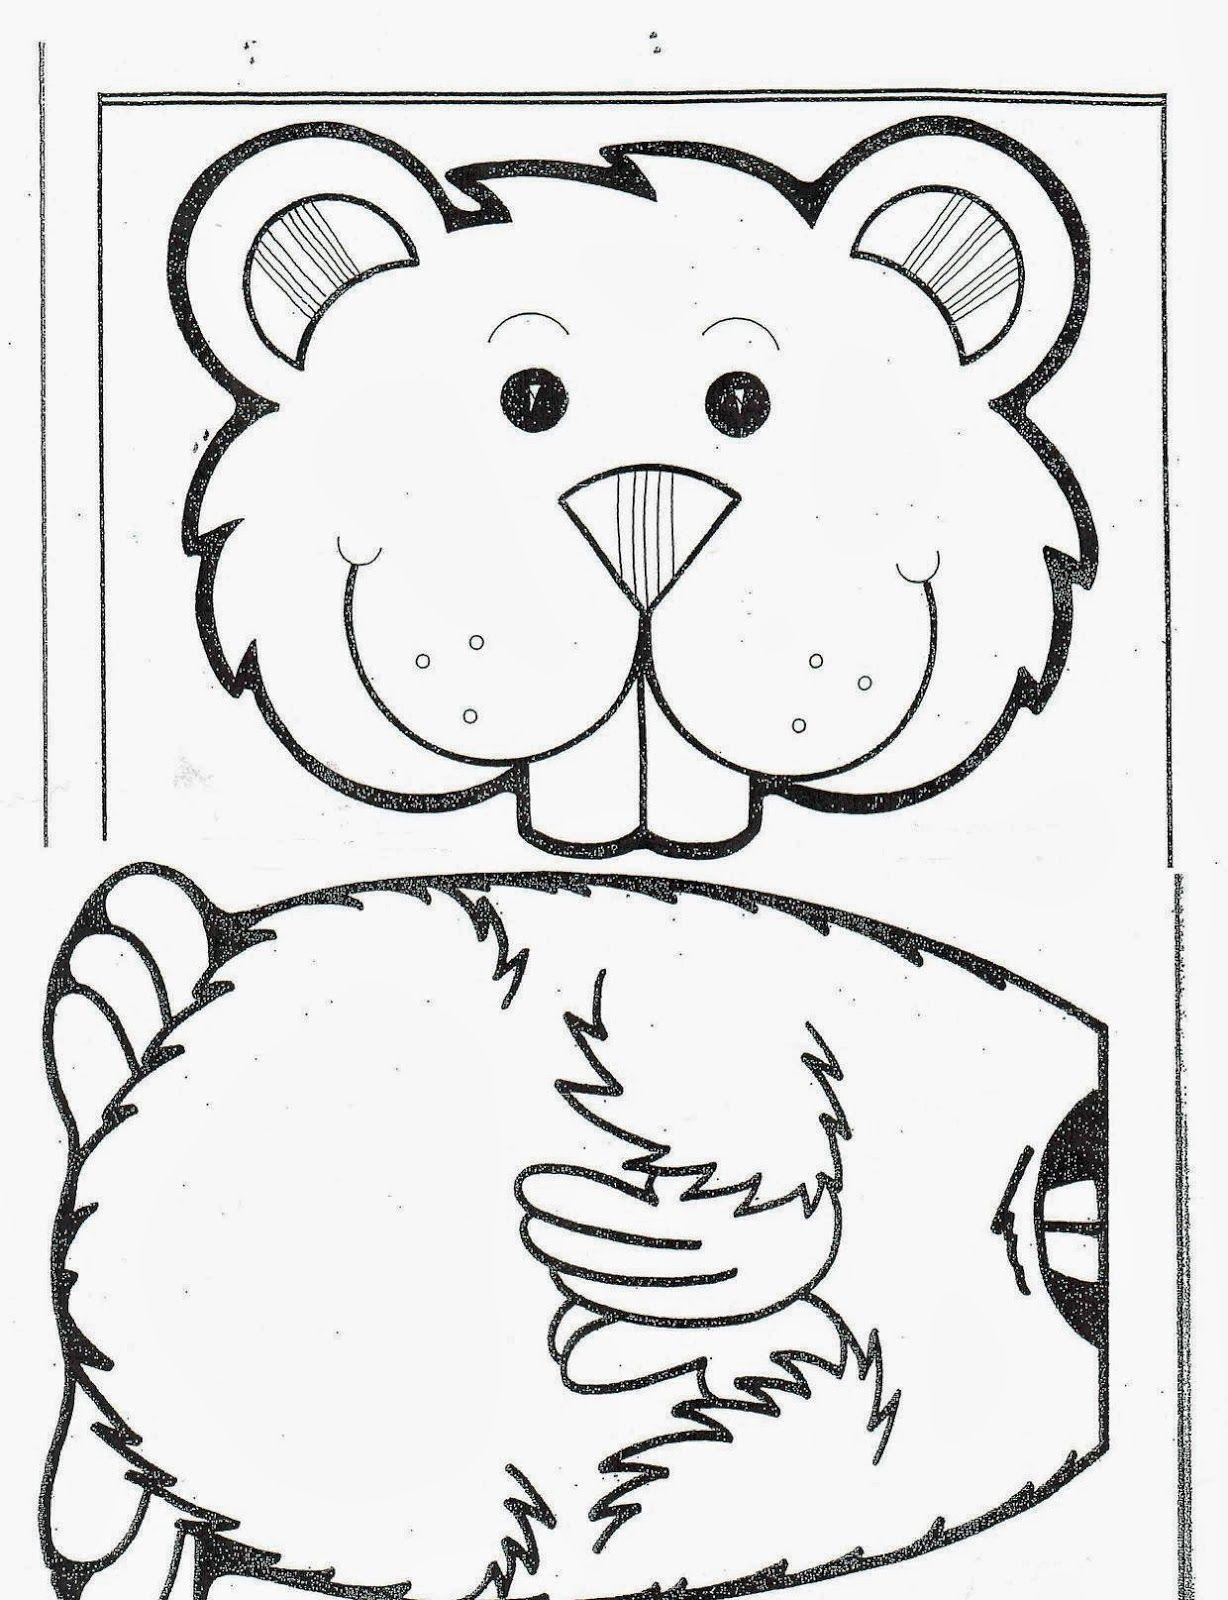 Groundhog Day Groundhog Day Activities Kindergarten Groundhog